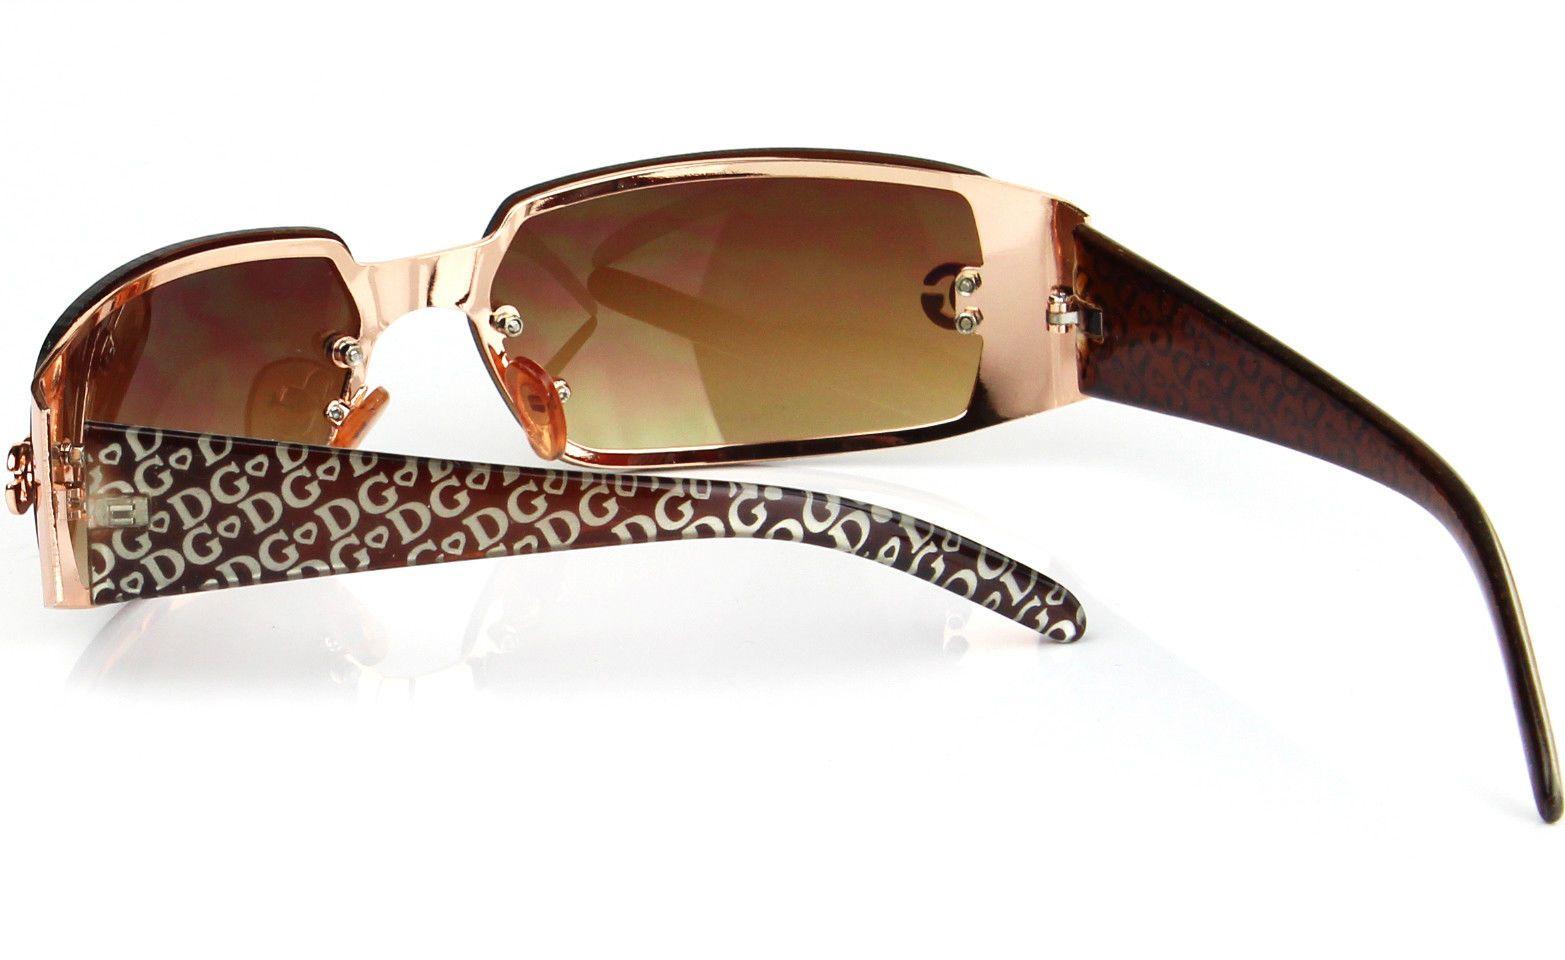 6d931ebf74 DG Womens Fashion Designer Sunglasses Shades Rectangular Wrap Around Gold  Brown $5.99 End Date: 2019